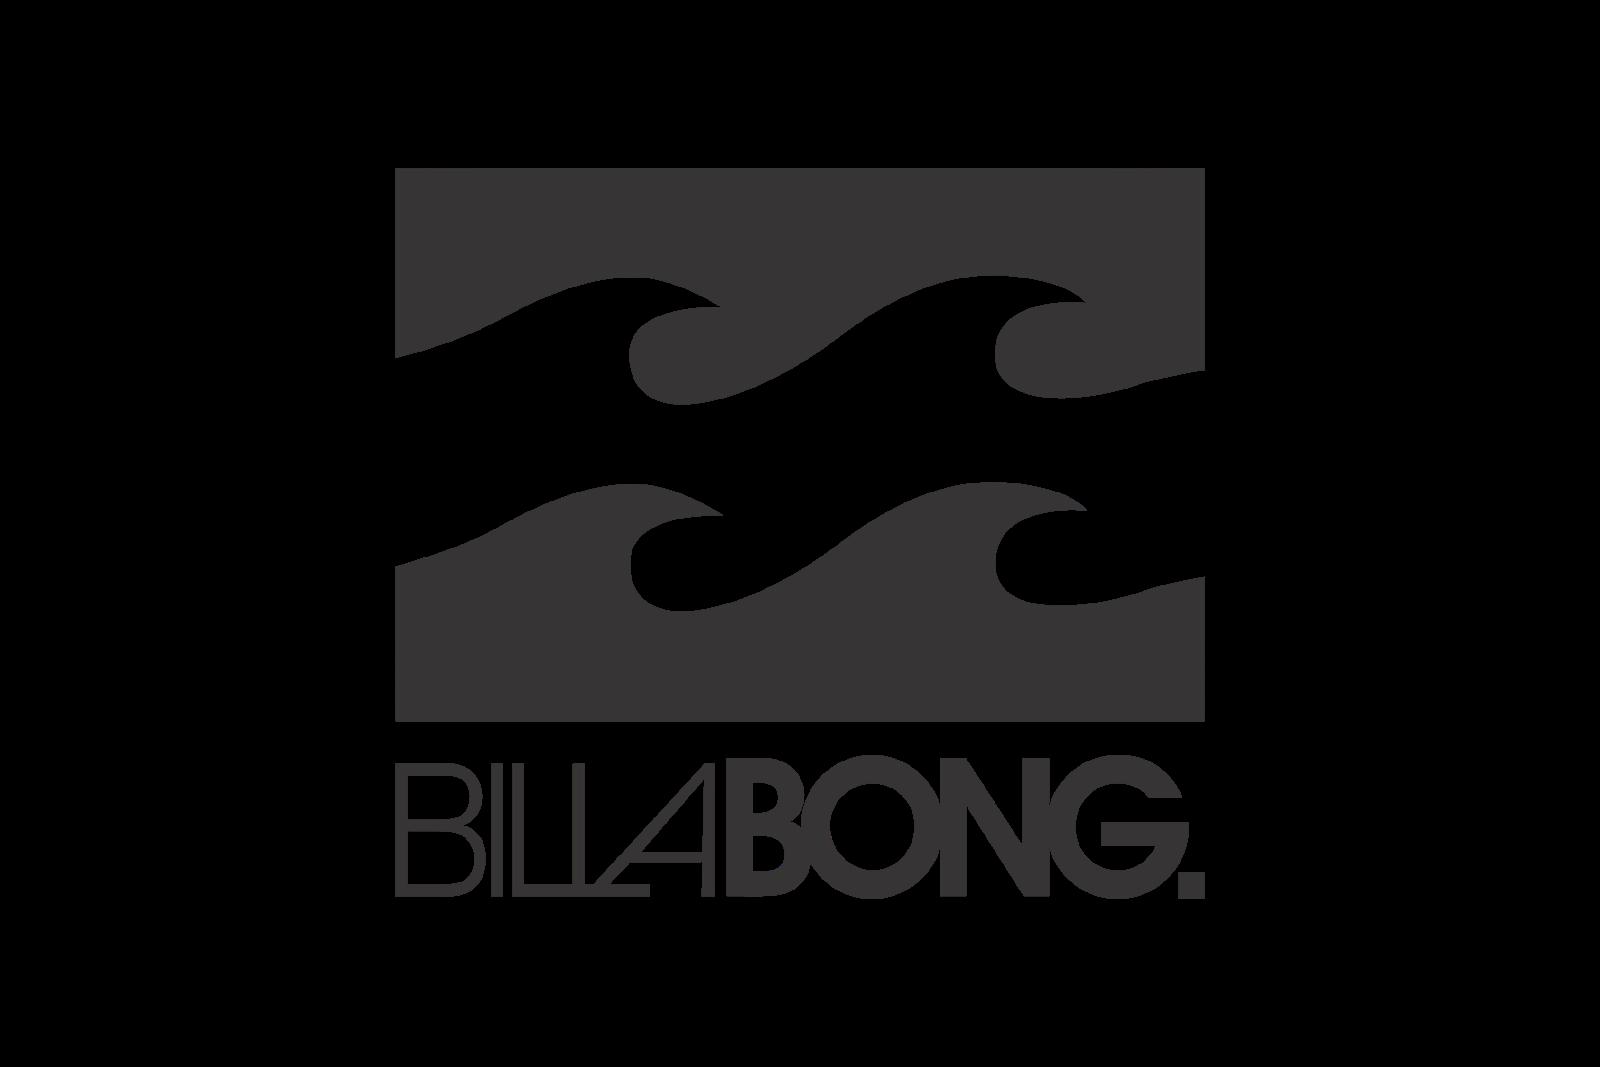 Billabong Logo Designer